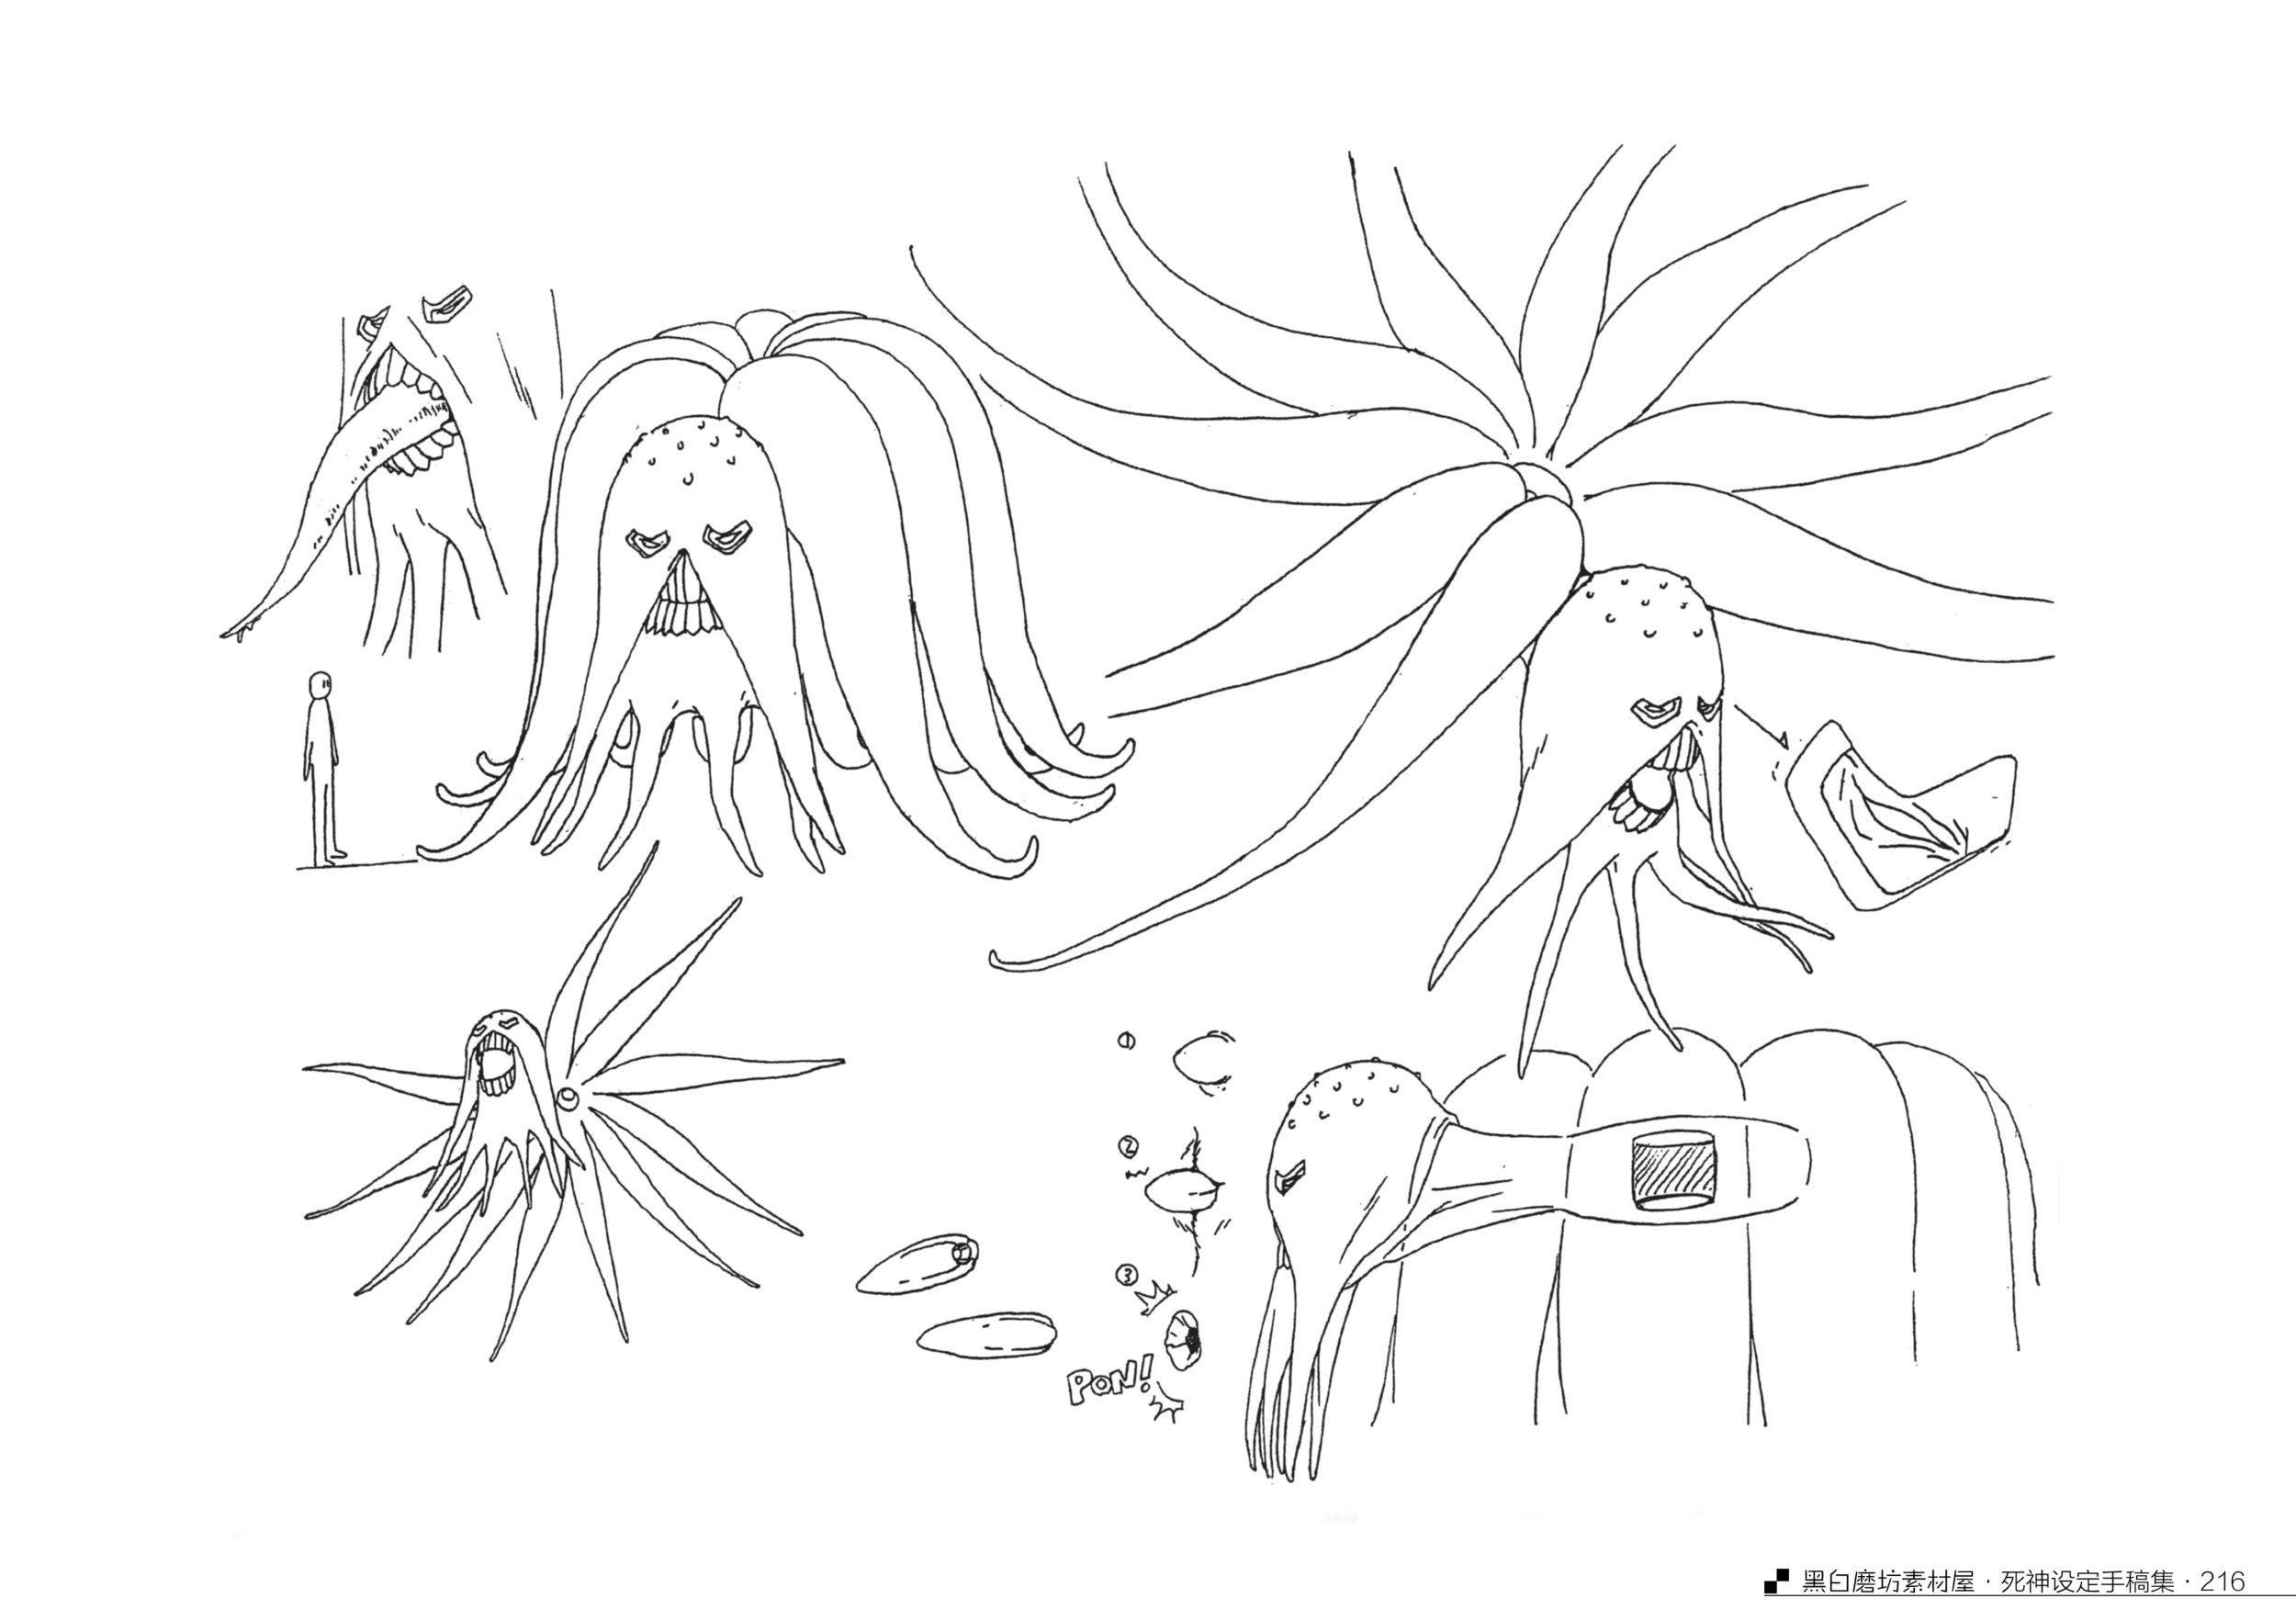 Art of the Bleach A - 194.jpg